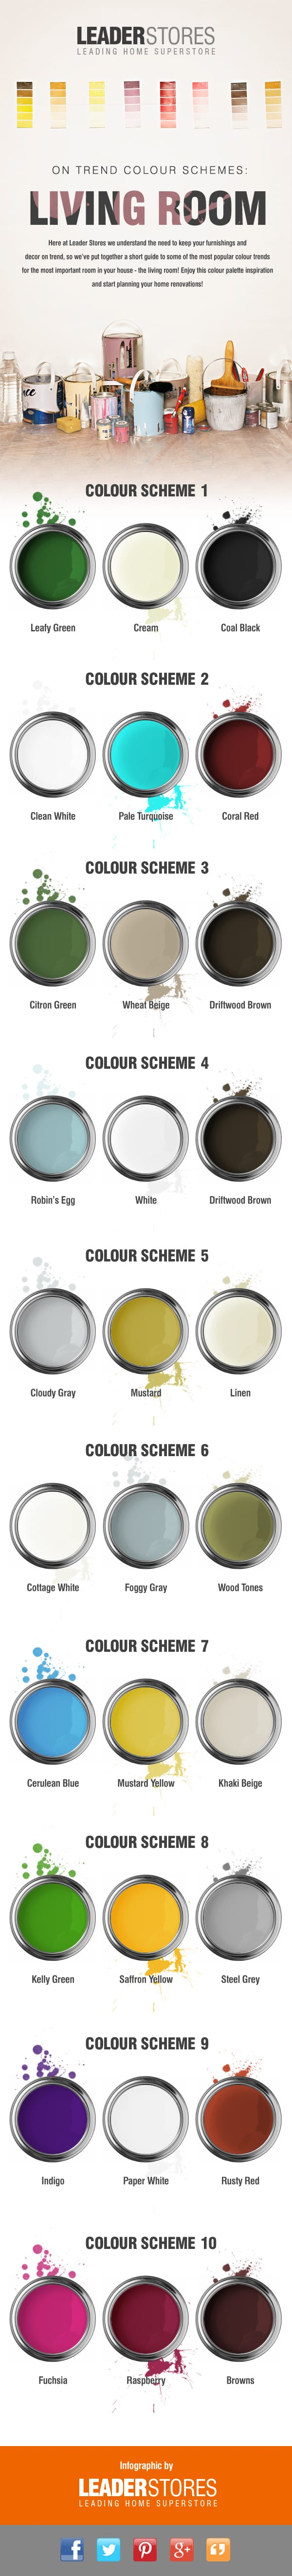 Living Room Colour Scheme Infographic